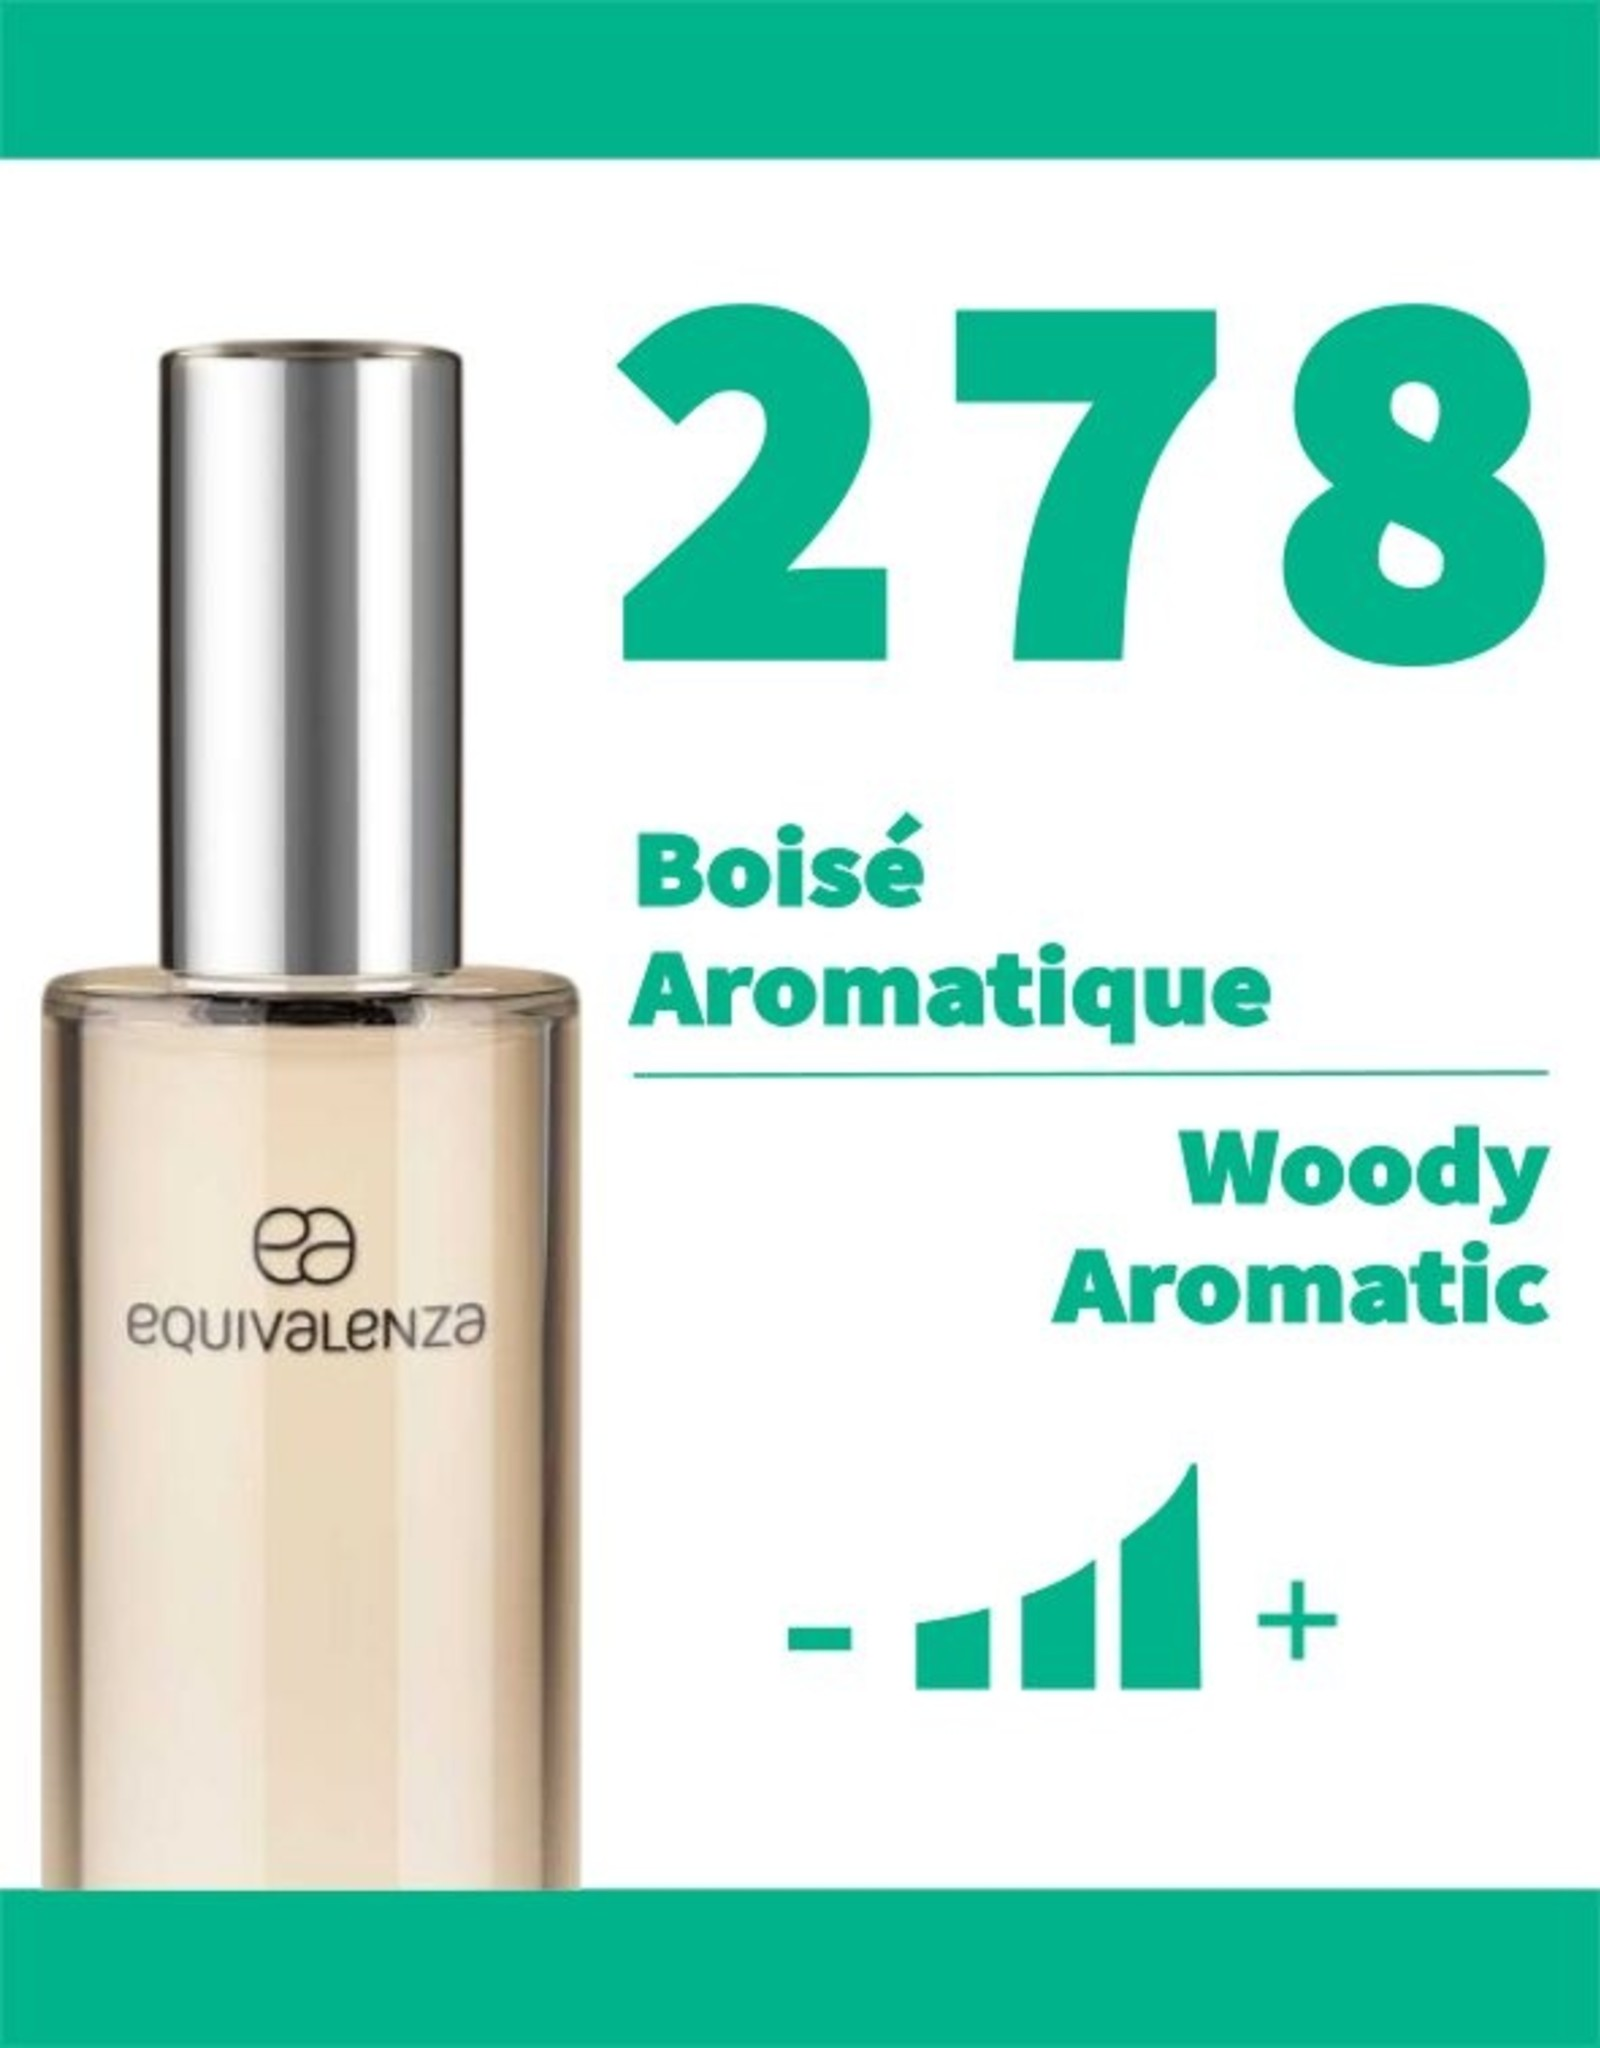 Equivalenza Woody Aromatic 278